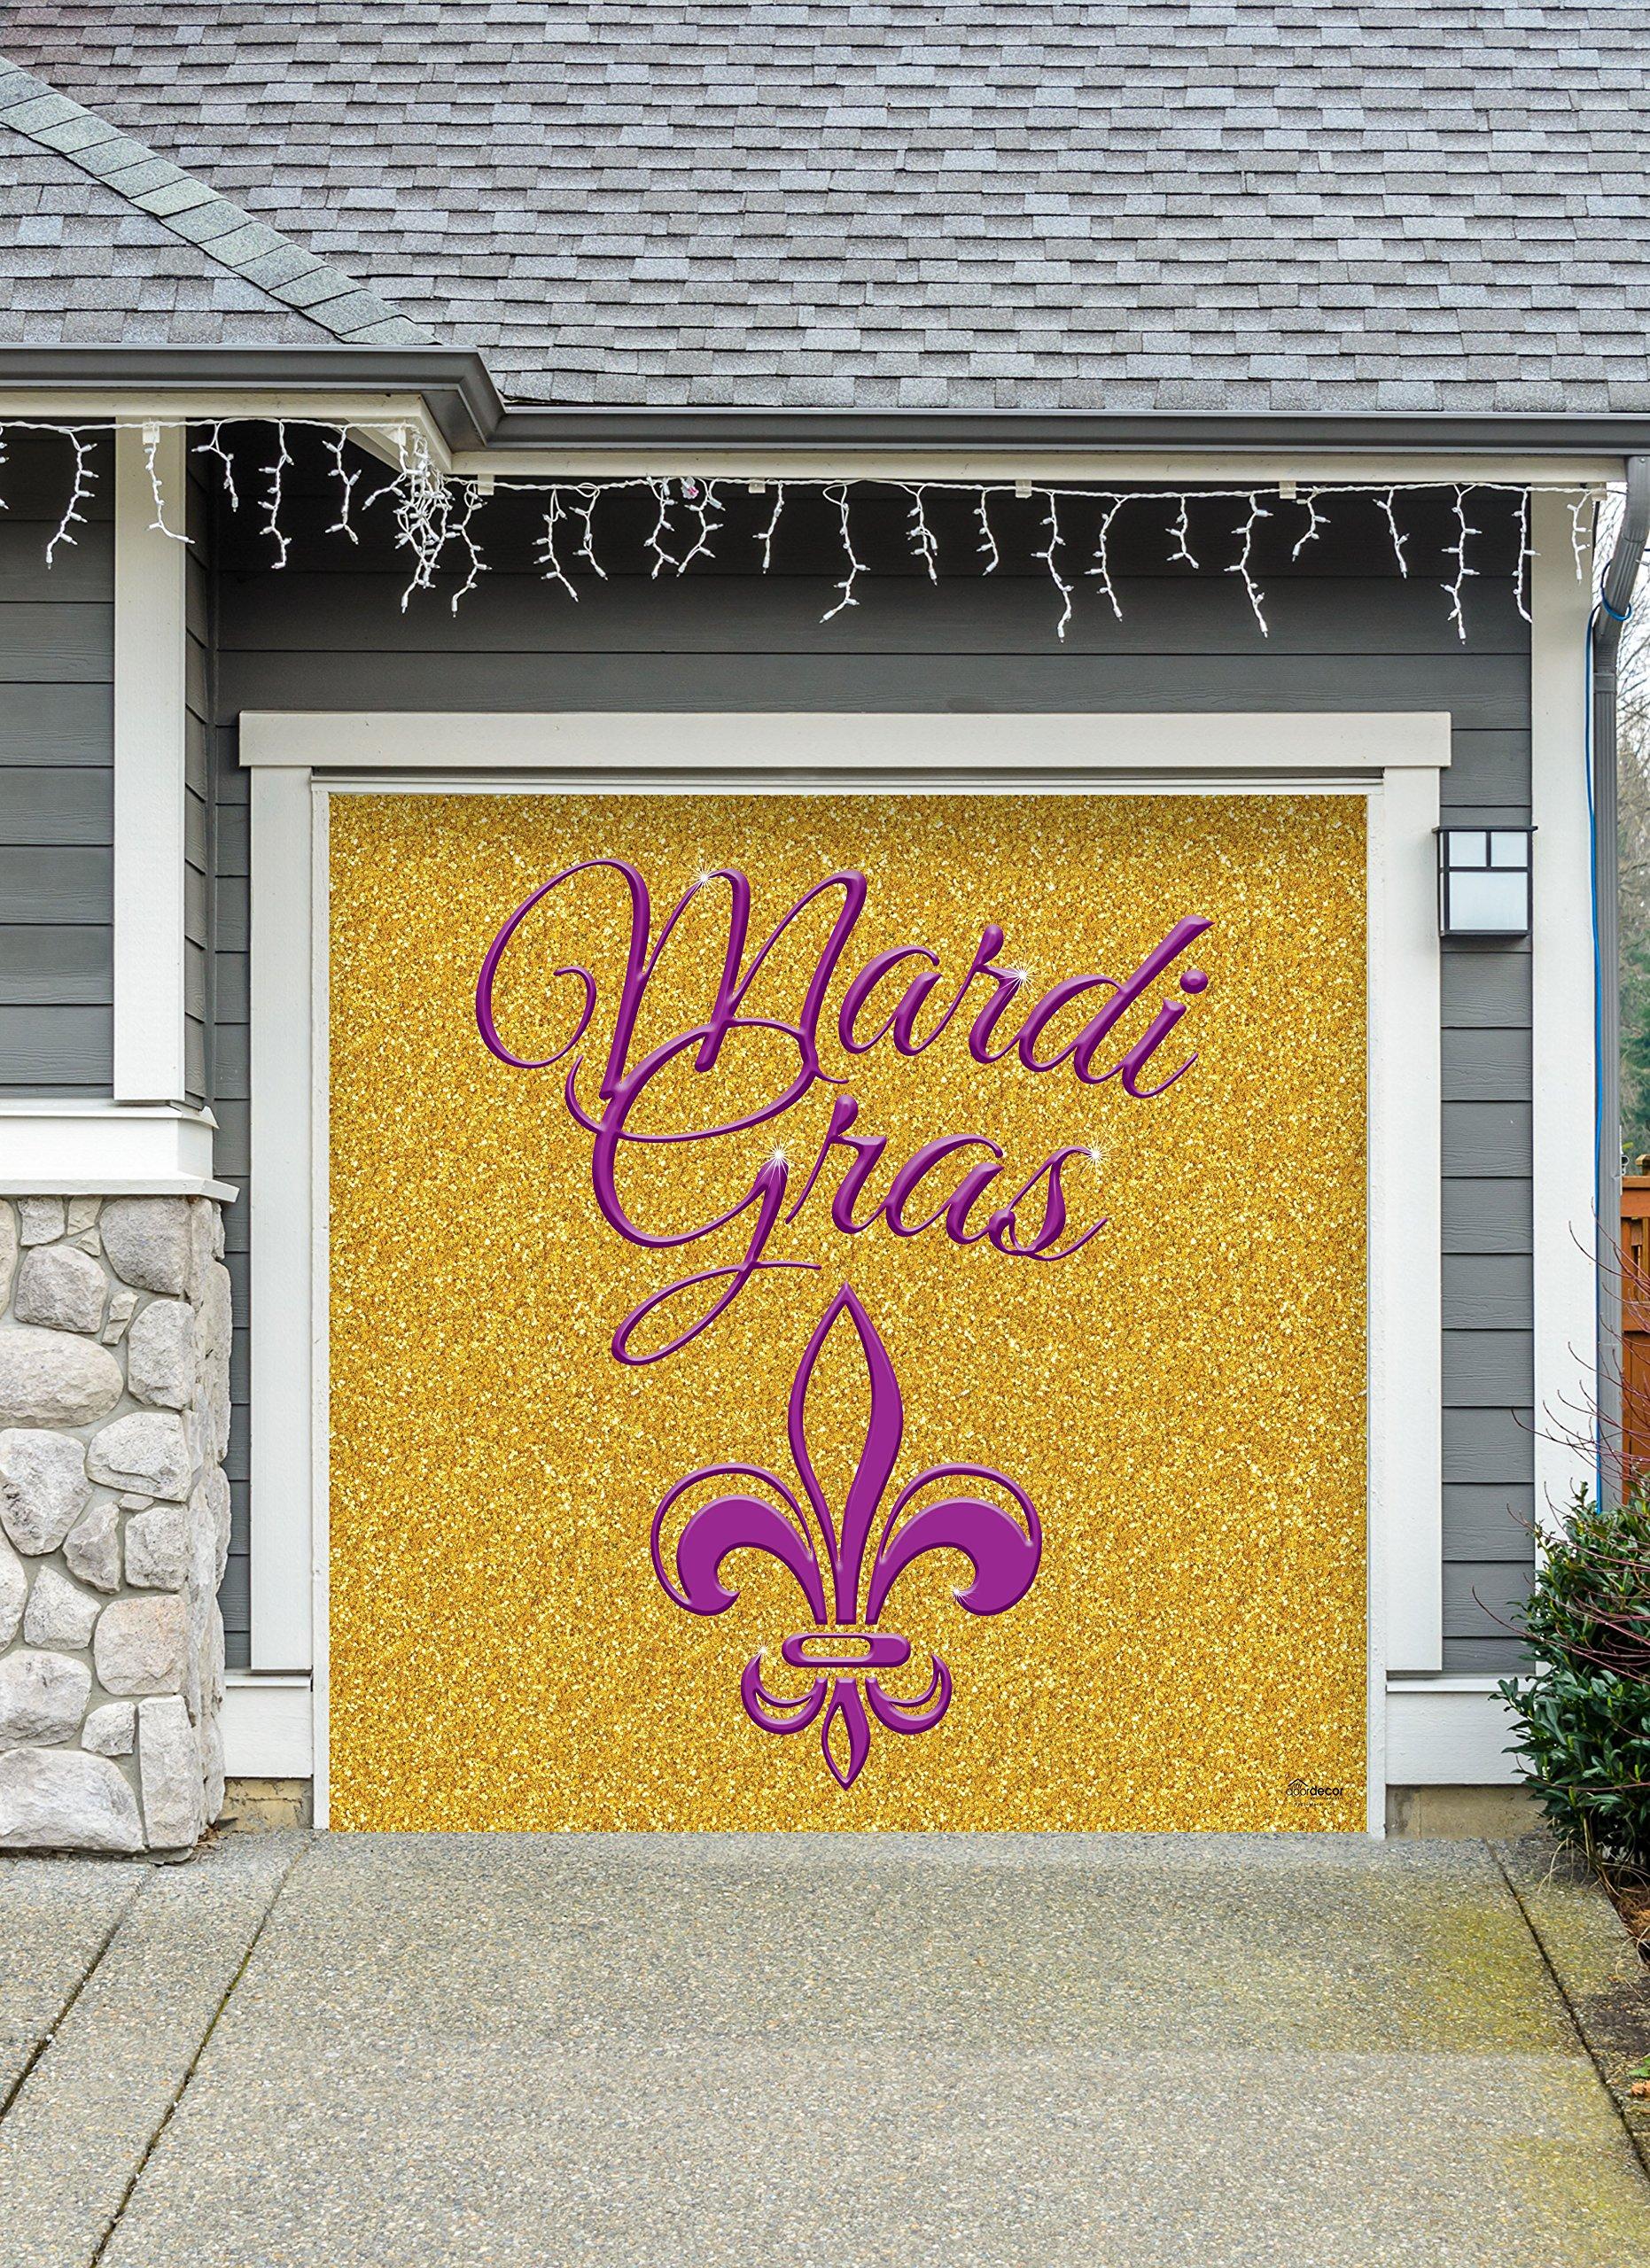 Outdoor Mardi Gras Decorations Garage Door Banner Cover Mural Décoration 8'x8' - Mardi Gras Gold Glitter- ''The Original Mardi Gras Supplies Holiday Garage Door Banner Decor'' by Victory Corps